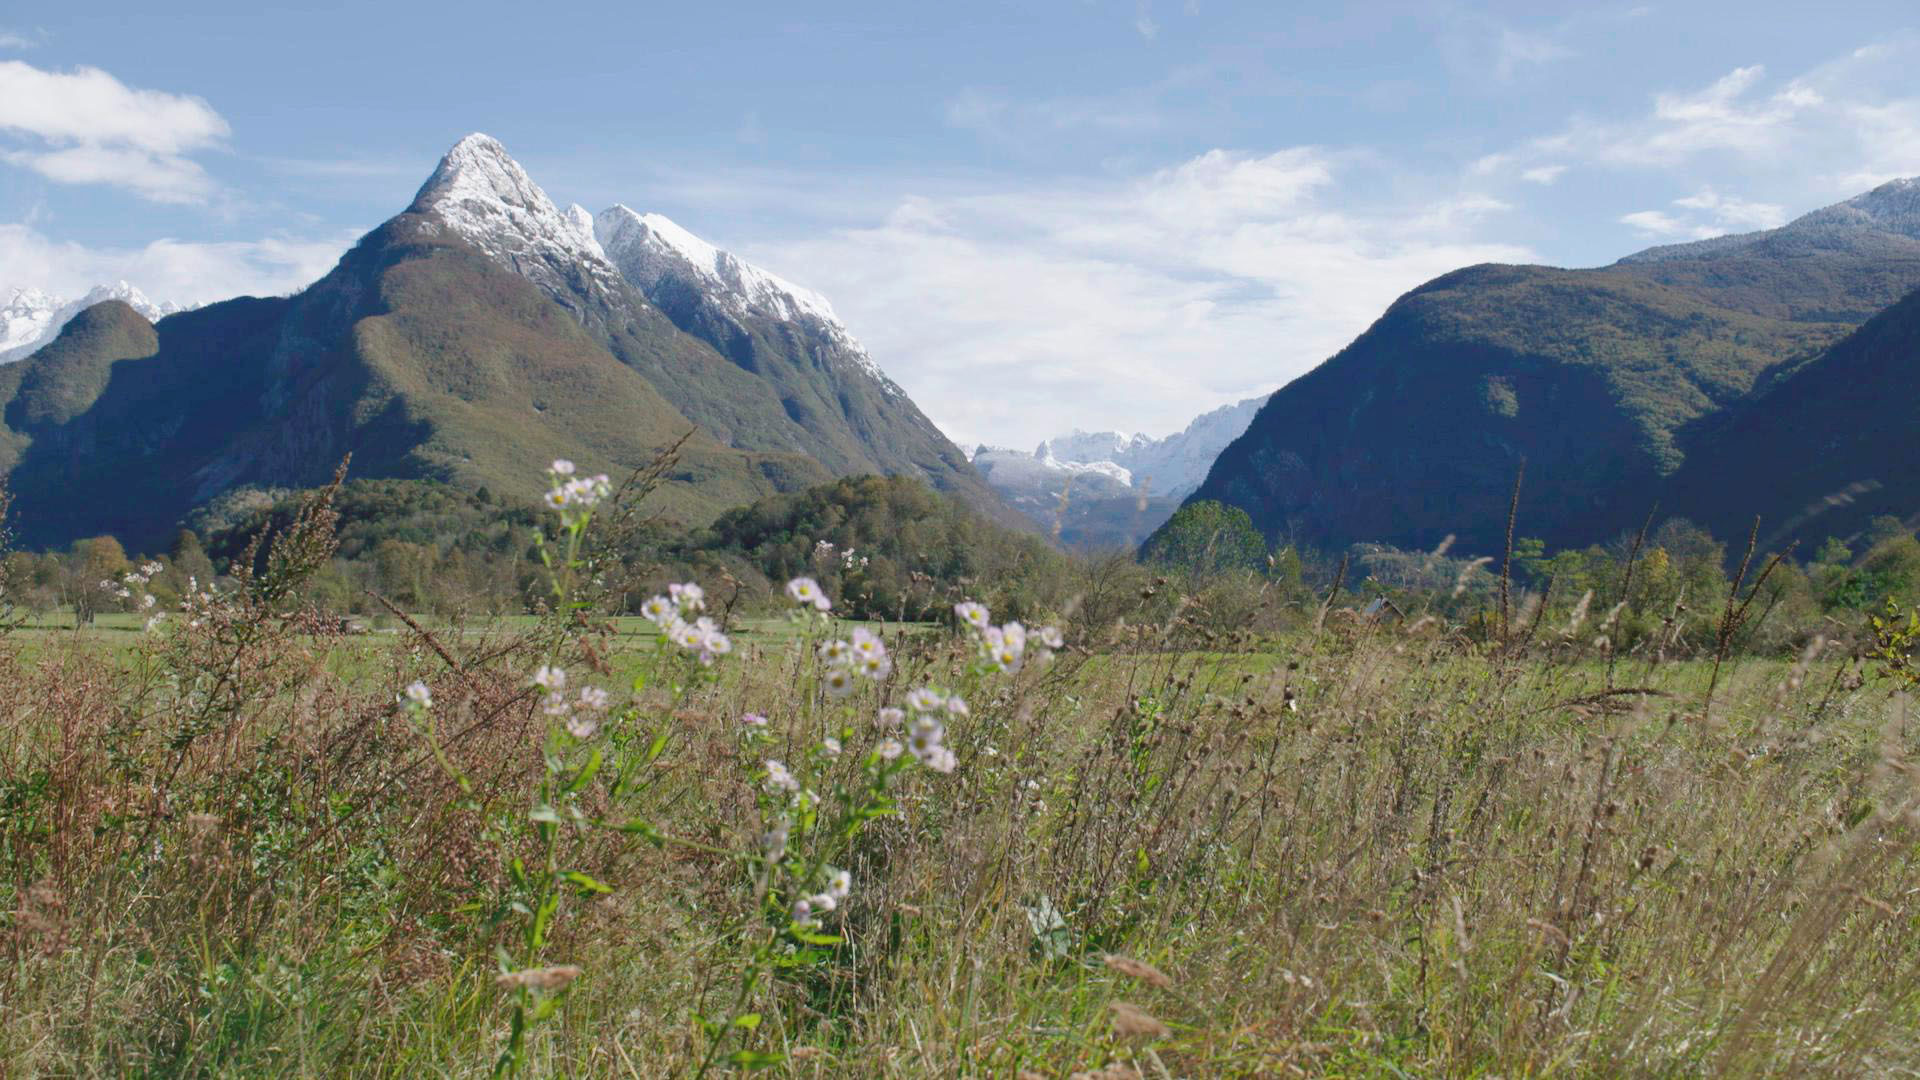 02 Blick auf den Triglav den höchsten Berg Sloweniens